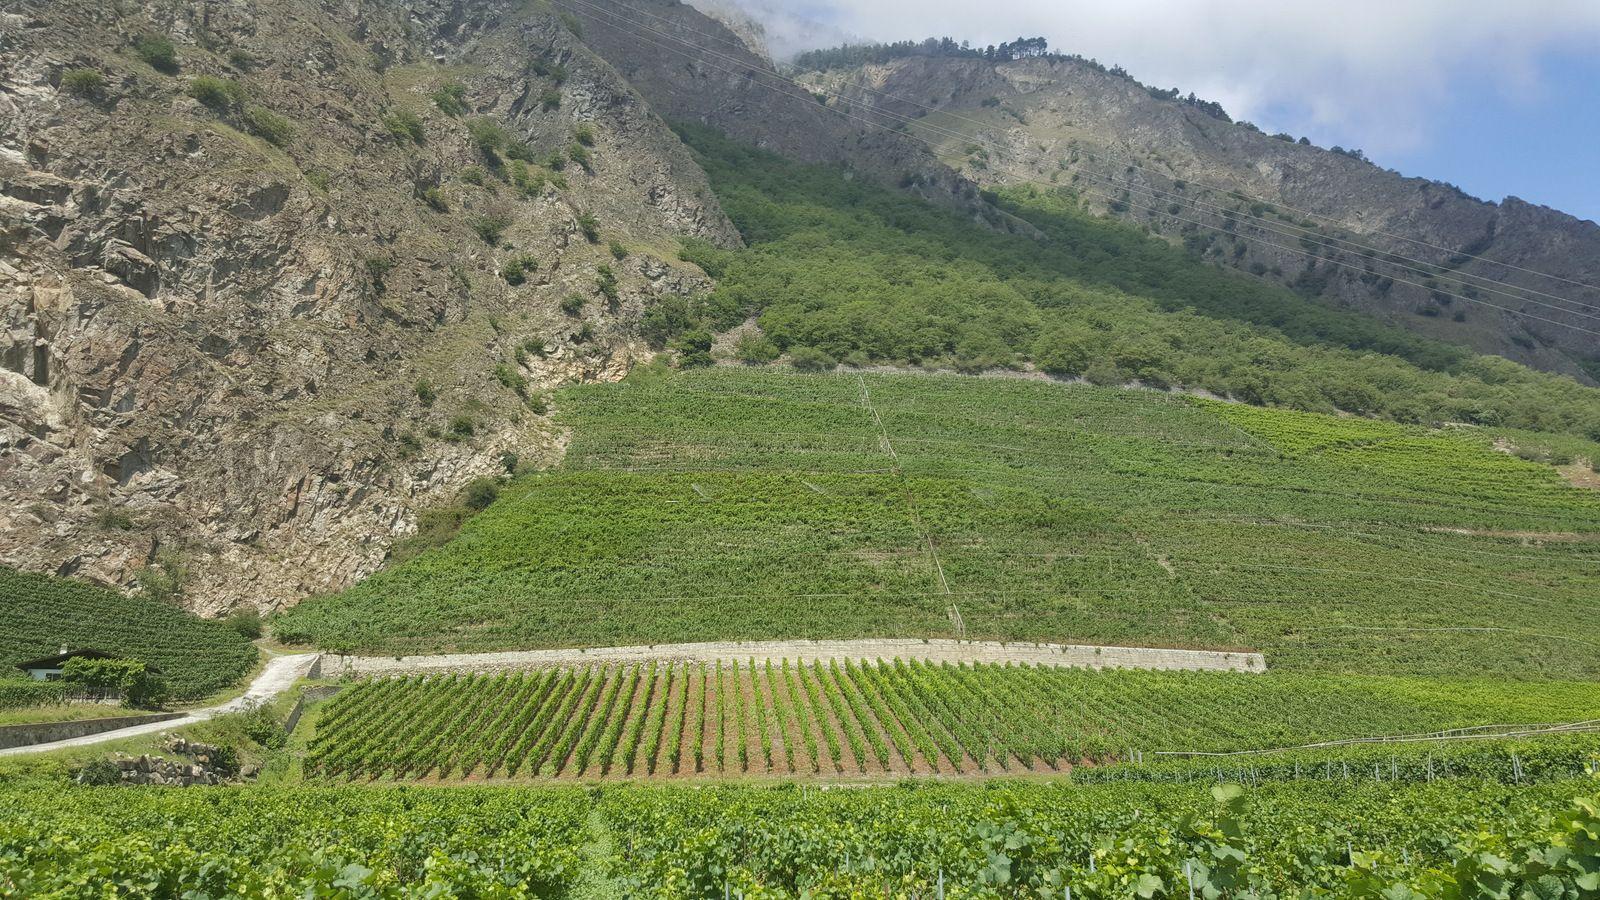 Le grand terroir de Fully, en Valais ©Emmanuel Delmas